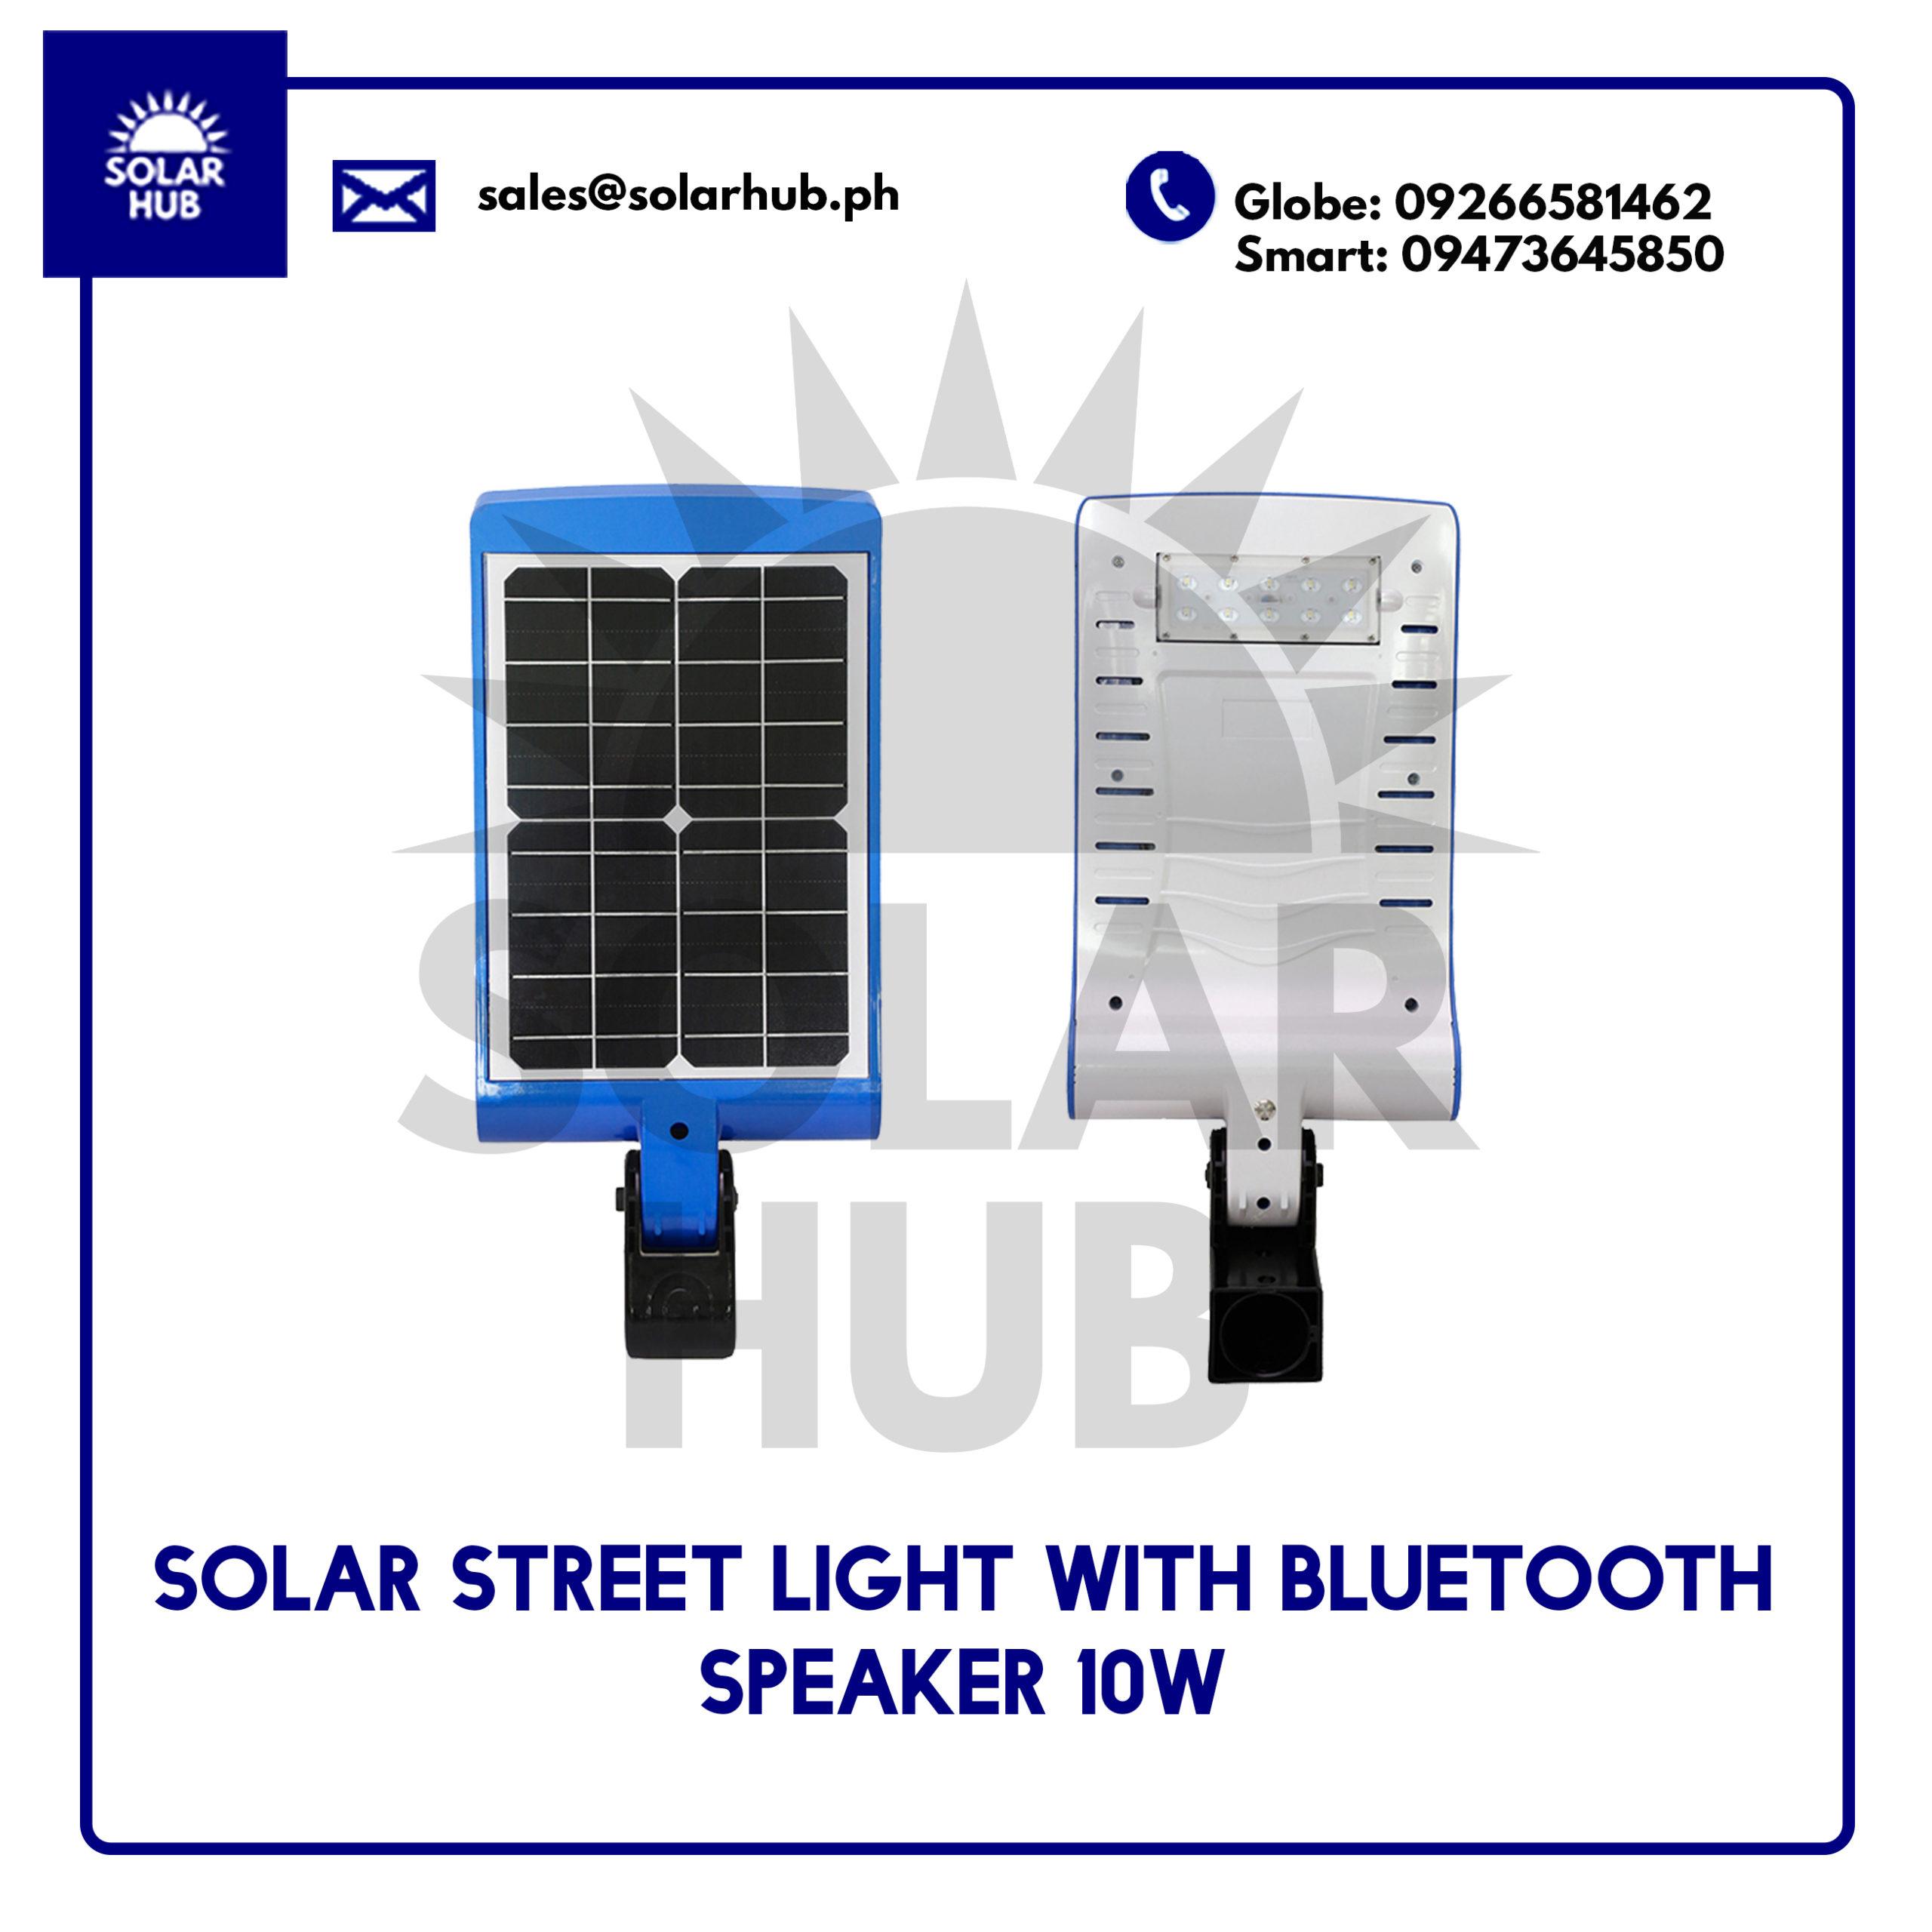 Solar Street Light With Bluetooth Speaker